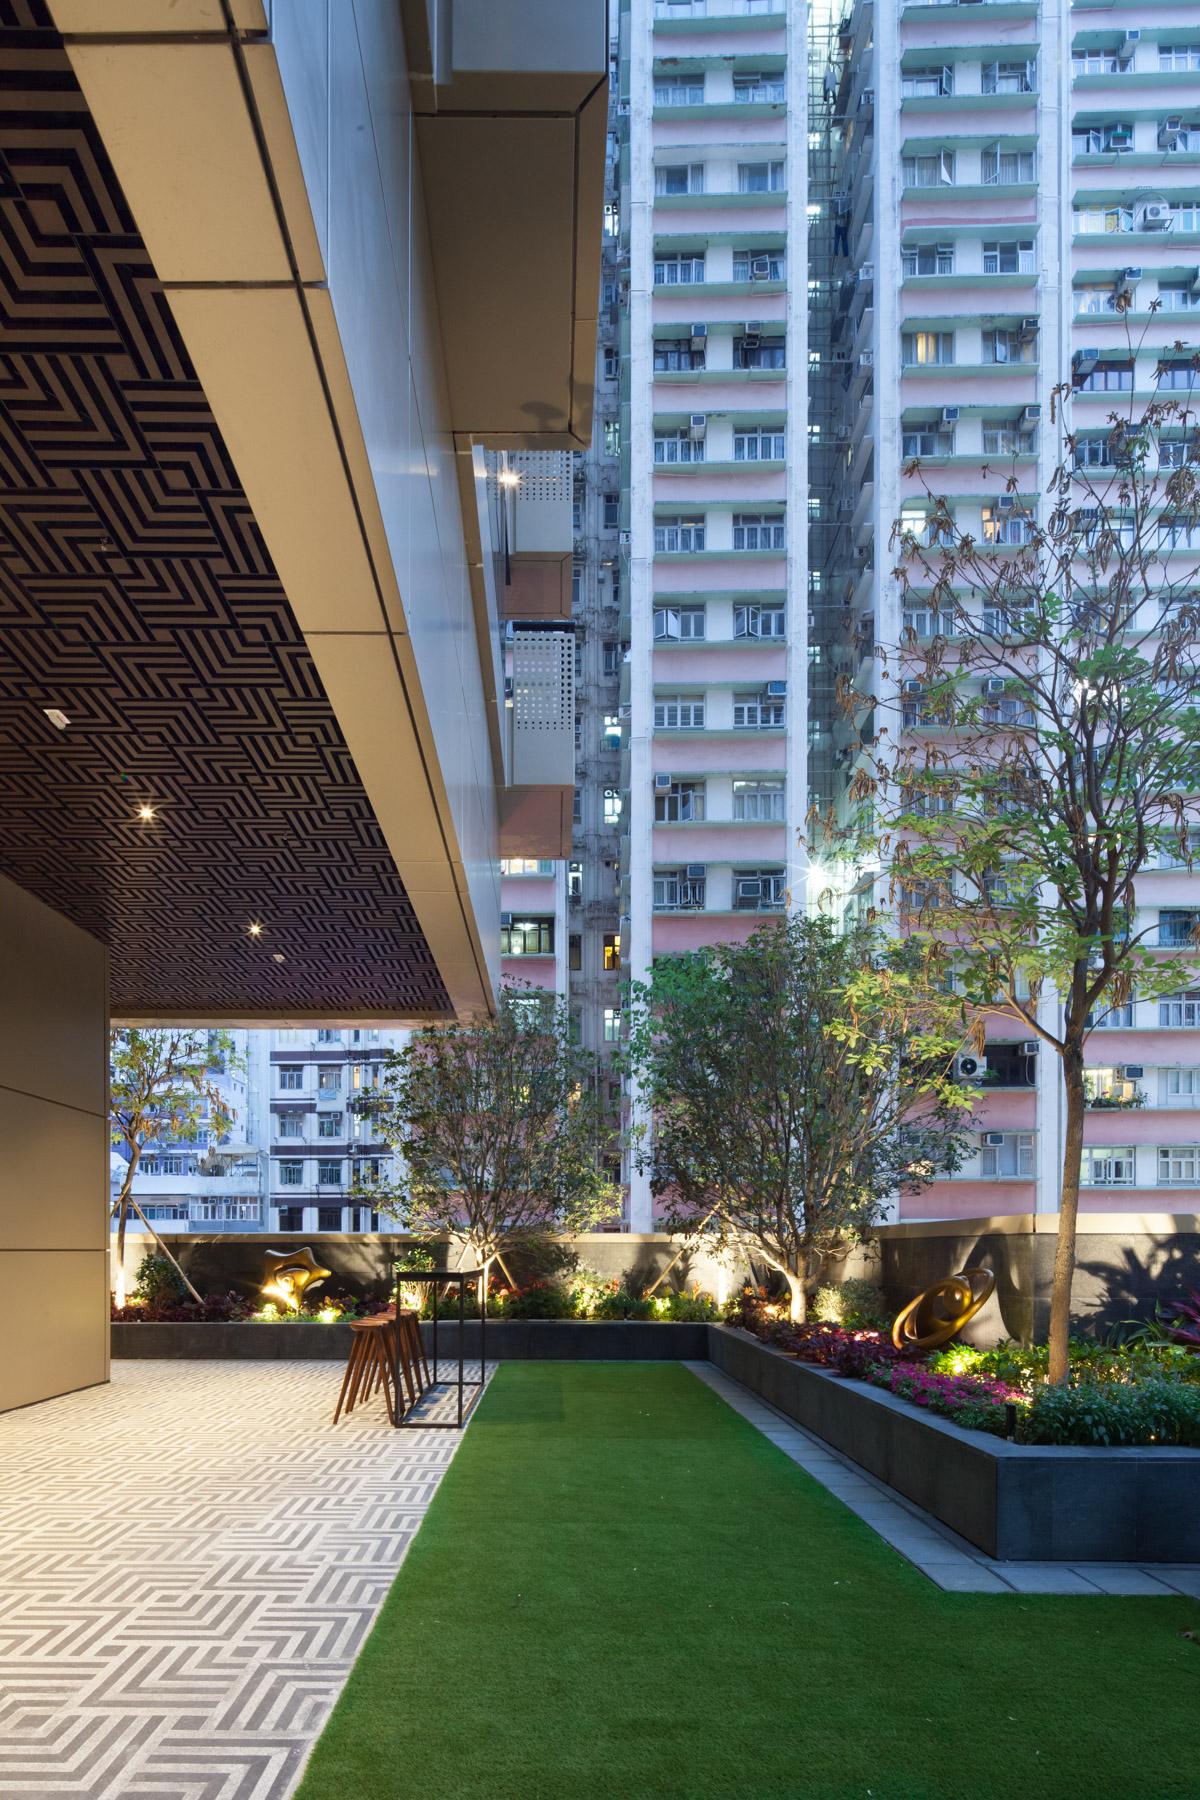 Luna_JM05_Landscape Garden-0246_WebRes Anahita Chouhan Make Architects.jpg